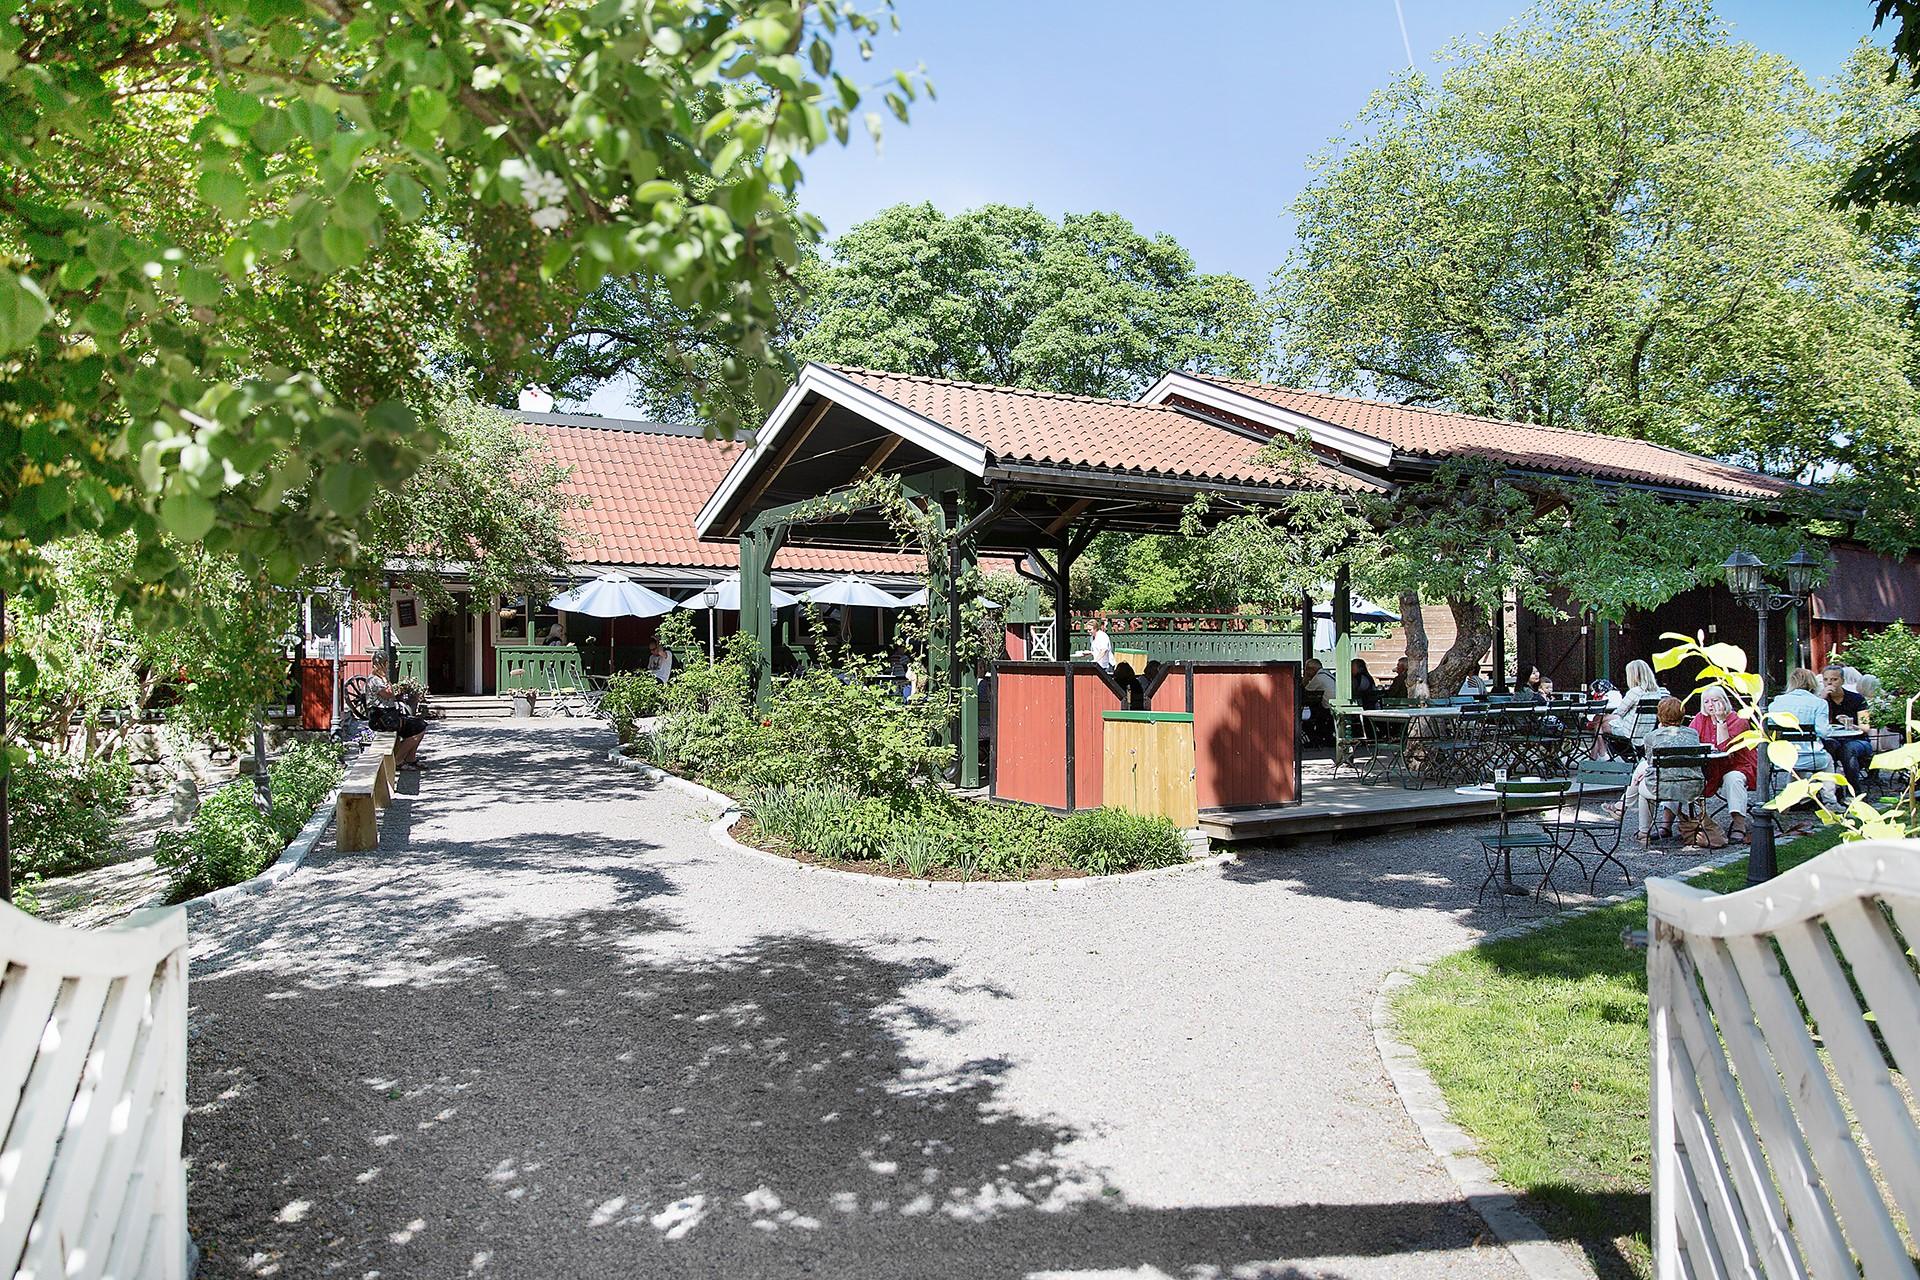 Folkskolegatan 20 - Lasse i parken